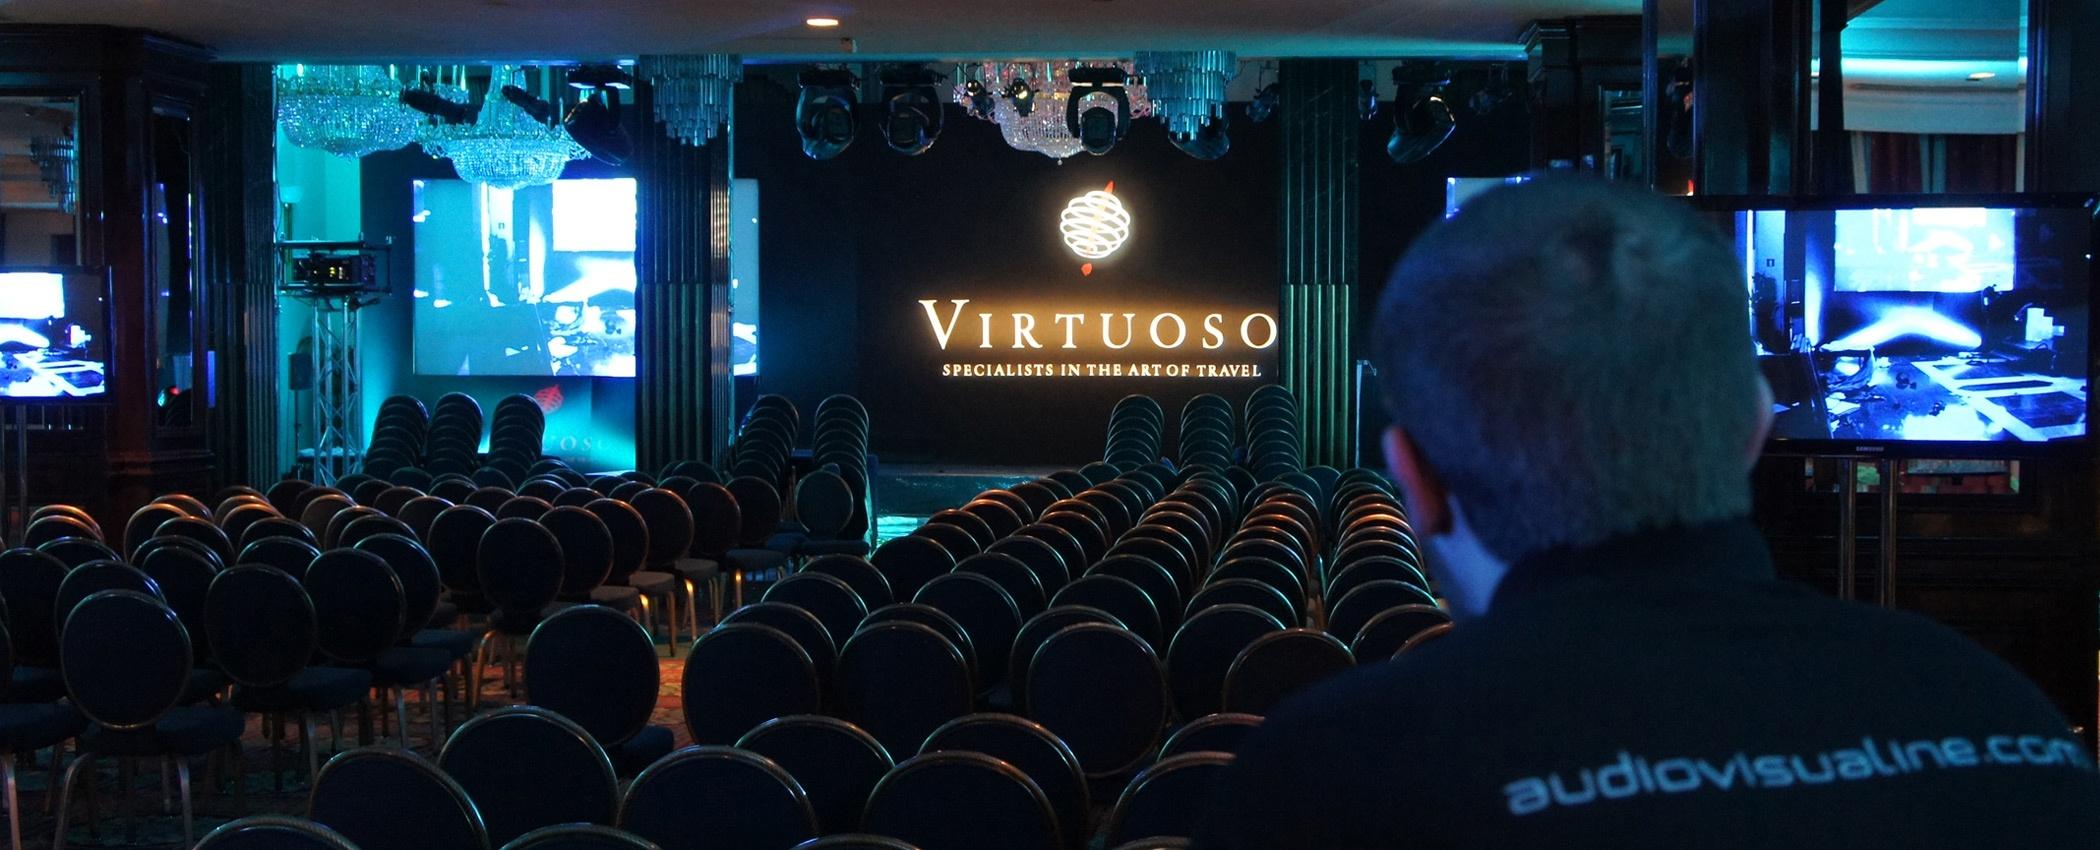 Evento Virtuoso